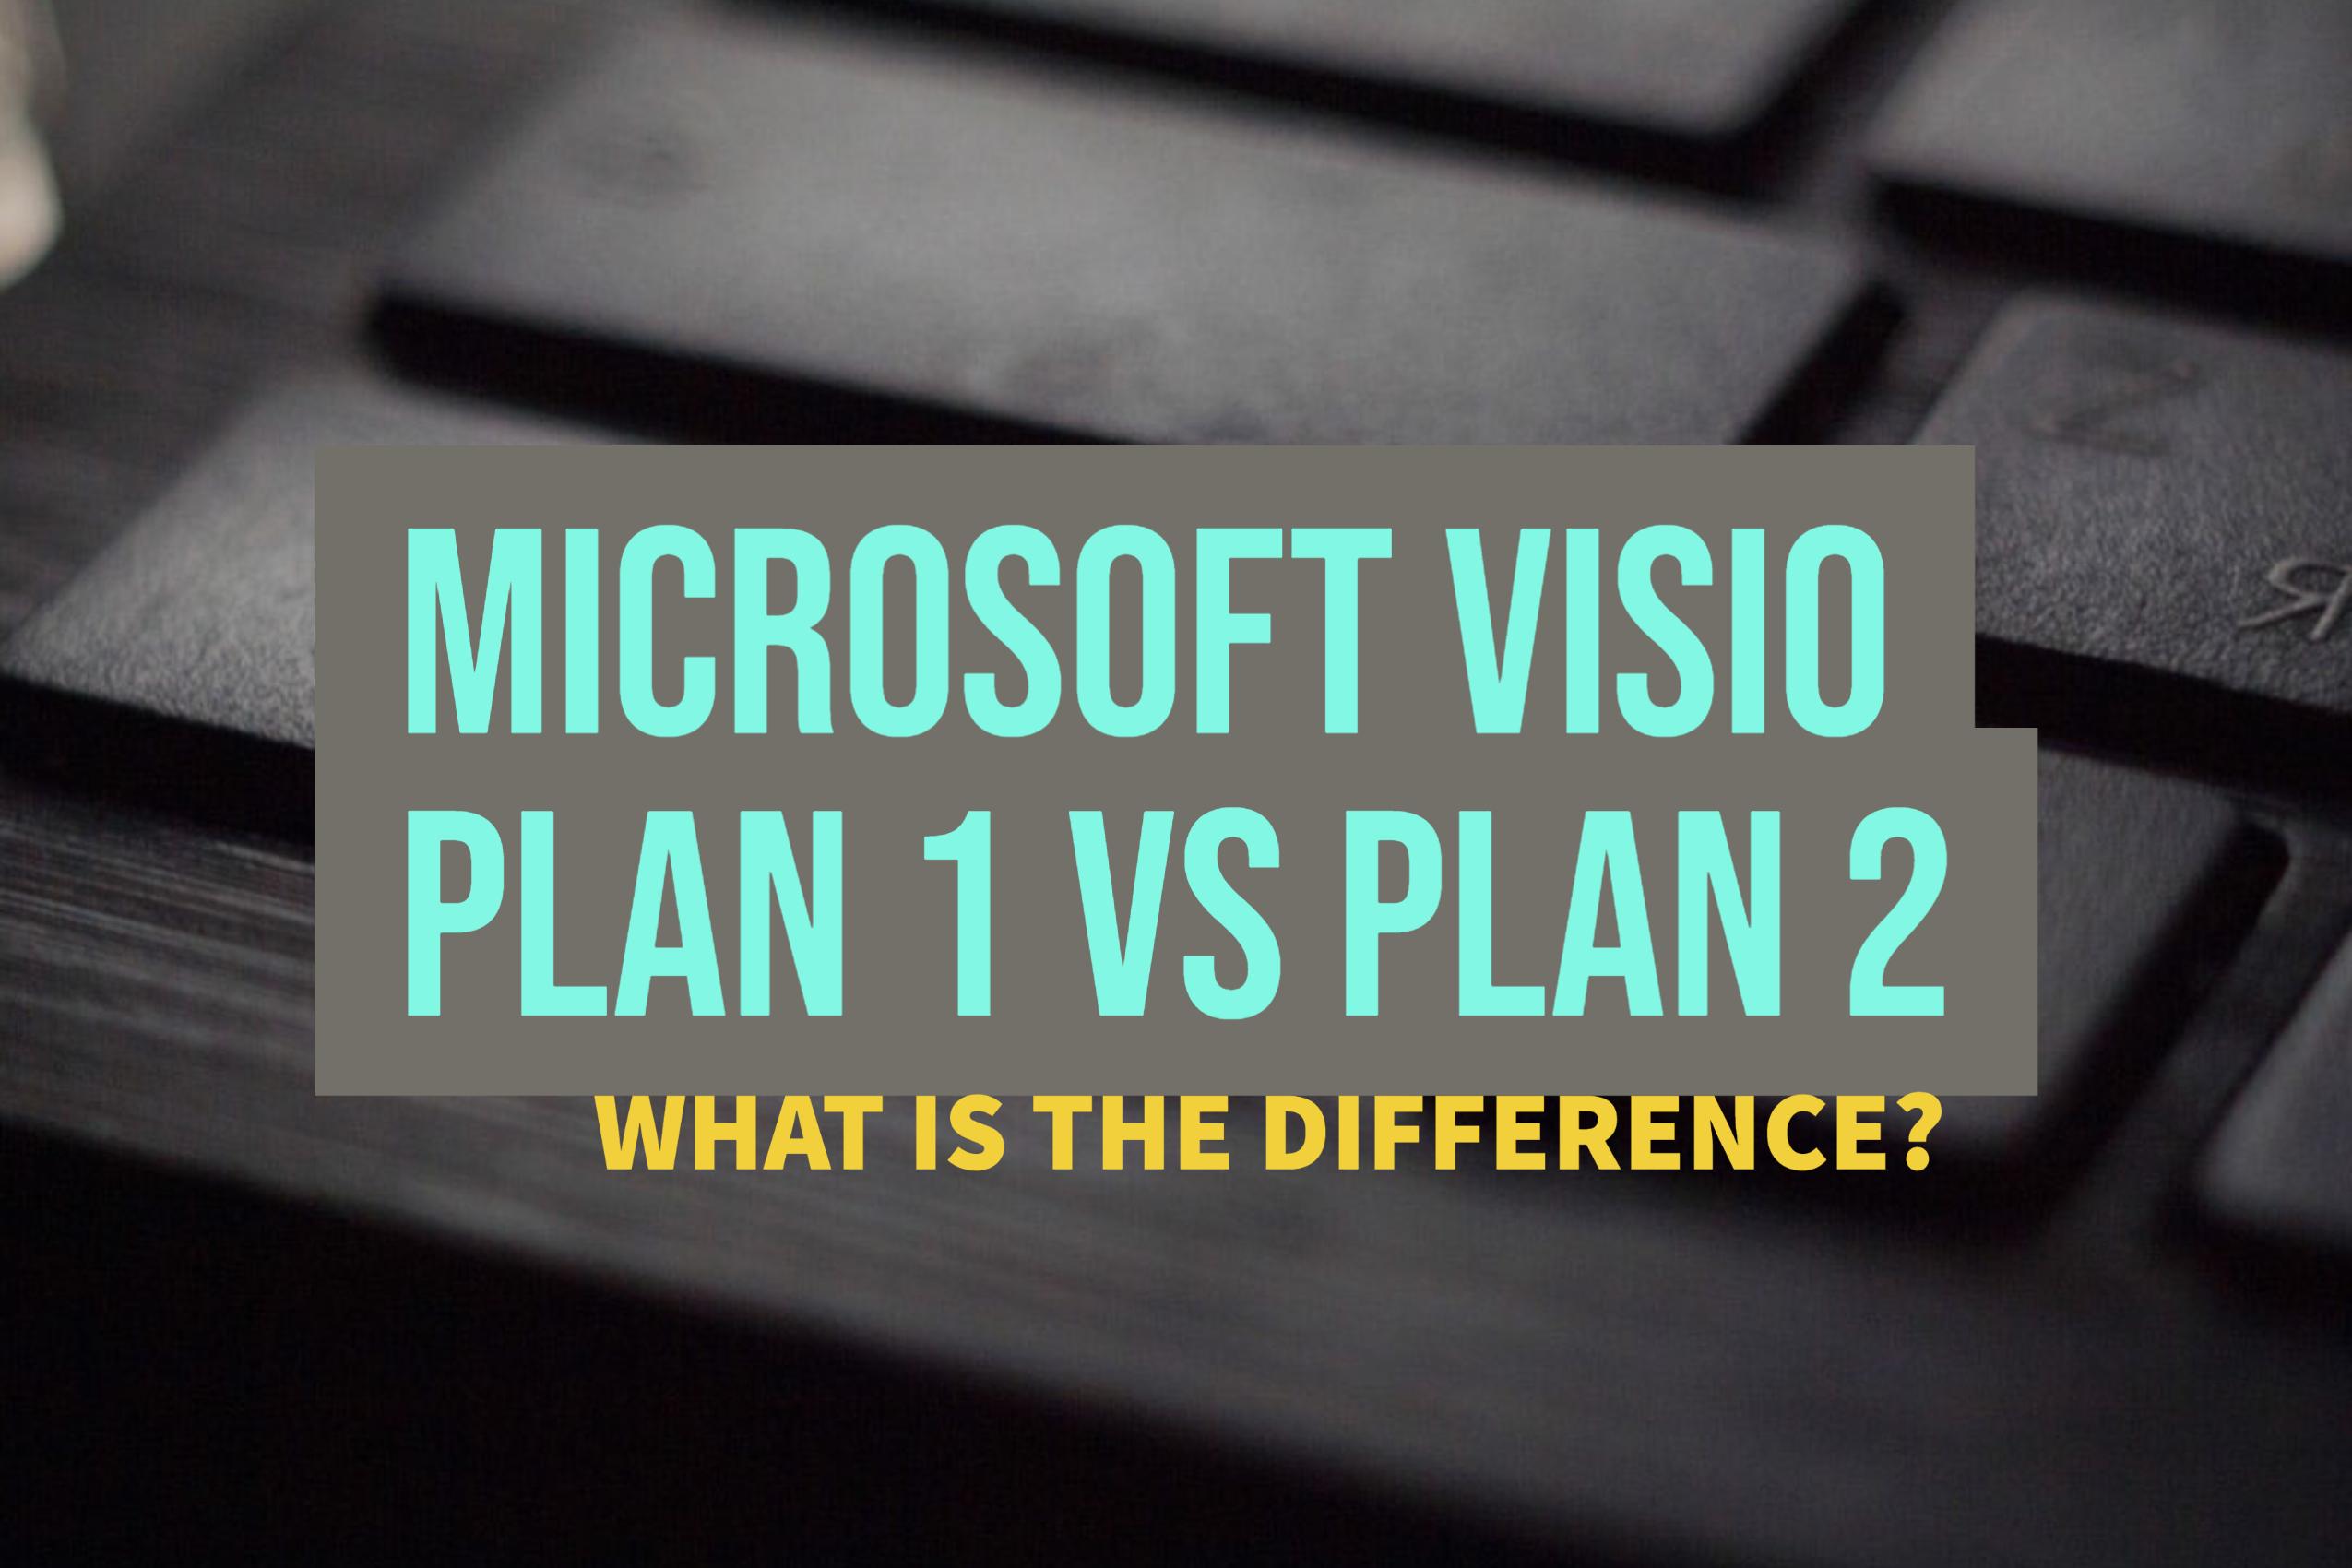 Microsoft Visio Plan 1 vs Plan 2